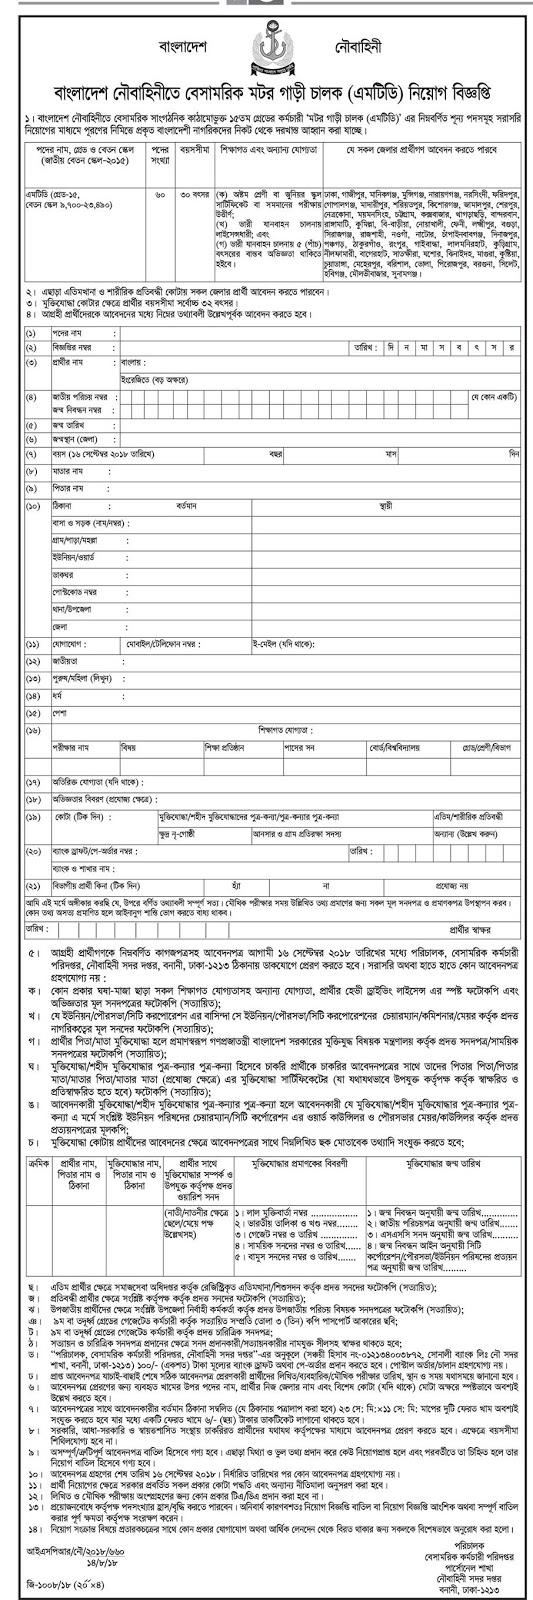 Bangladesh Navy Civilian Motor Driver (MTD) Job Circular 2018